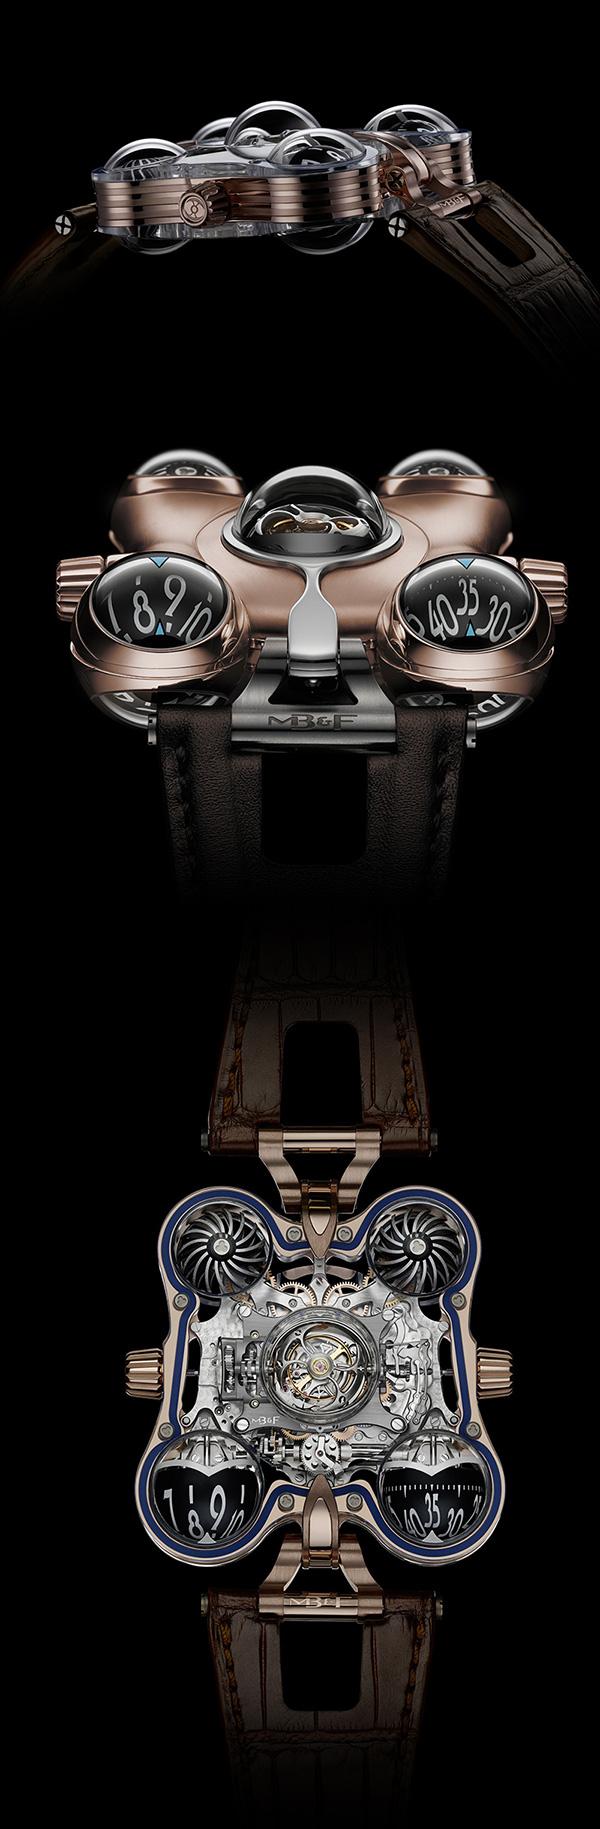 MB&F HM6 太空腕表